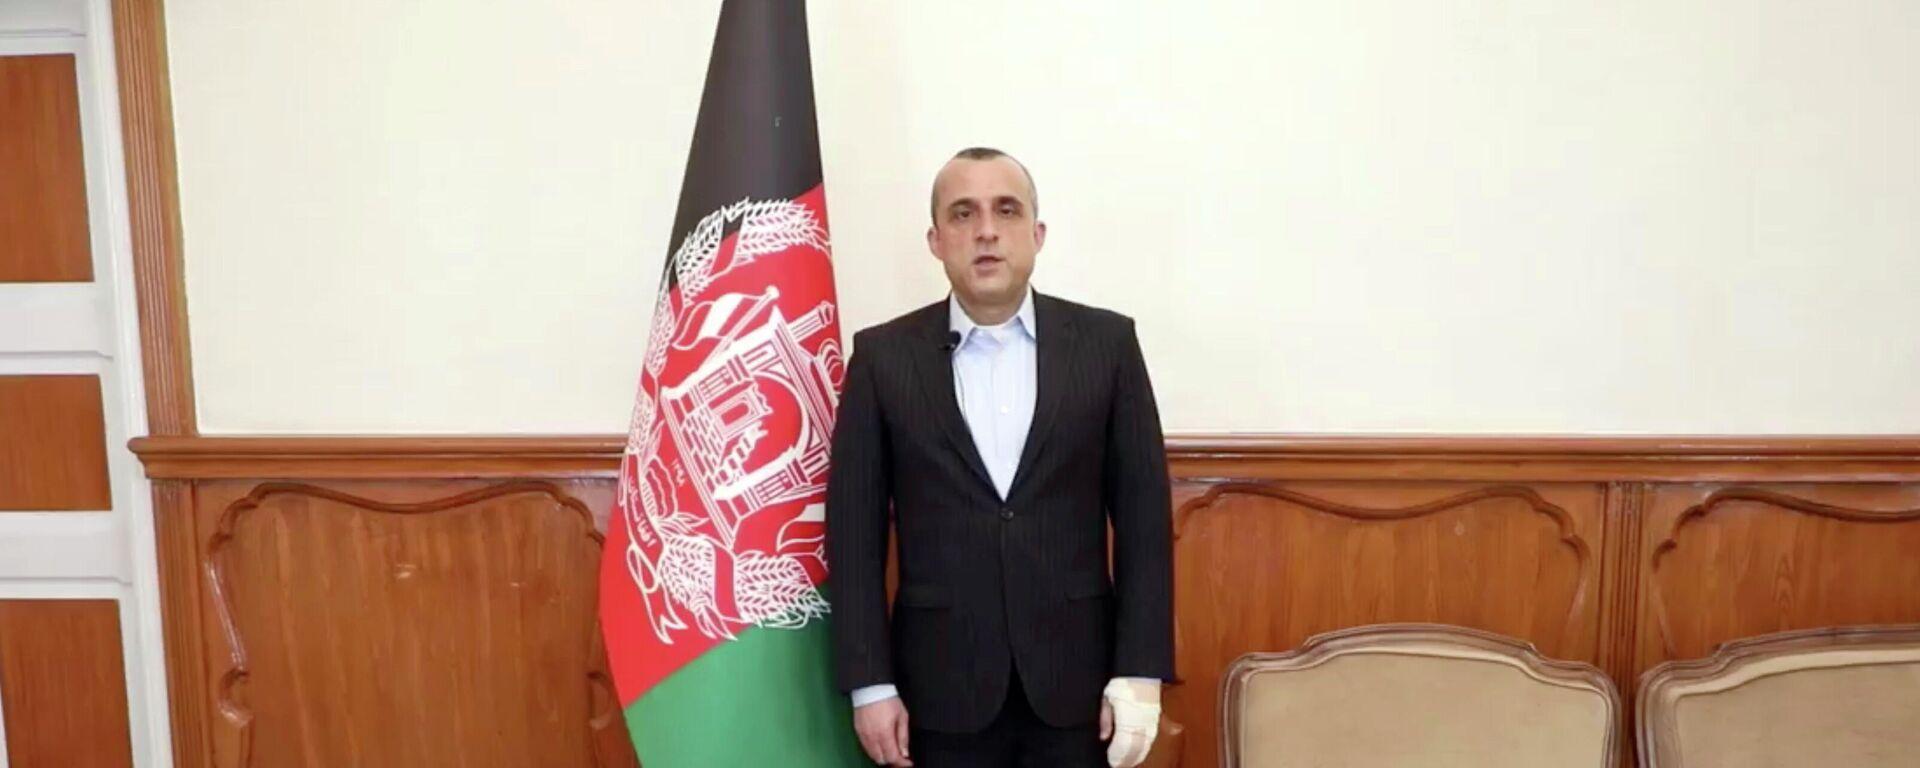 Вице-президент Афганистана Амрулла Салех - Sputnik Таджикистан, 1920, 13.08.2021